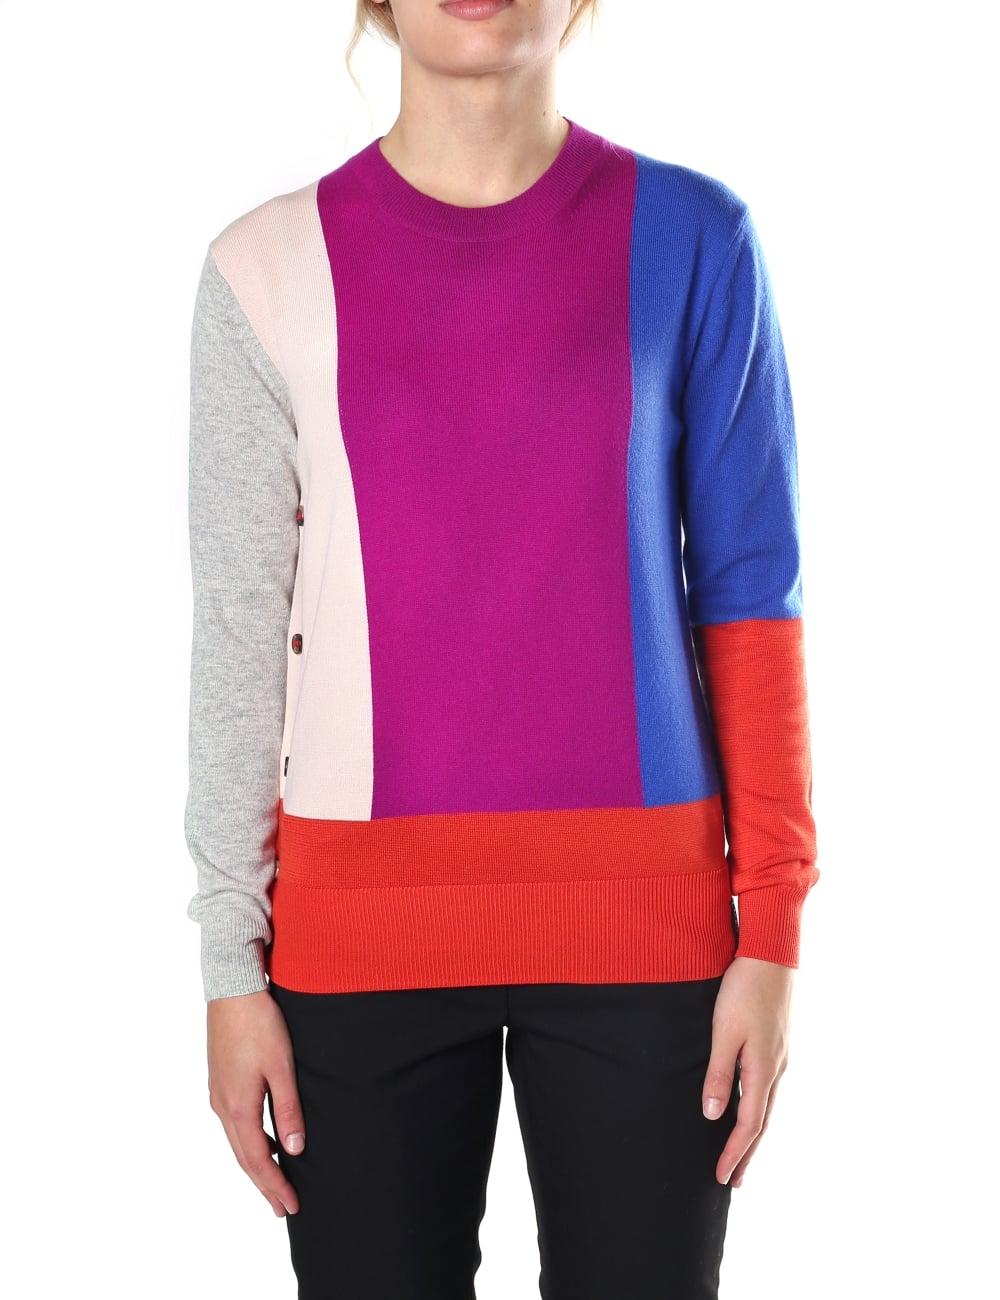 5b8c8f098bc32 Kenzo Women s Colour Block Crew Neck Buttoned Sweater